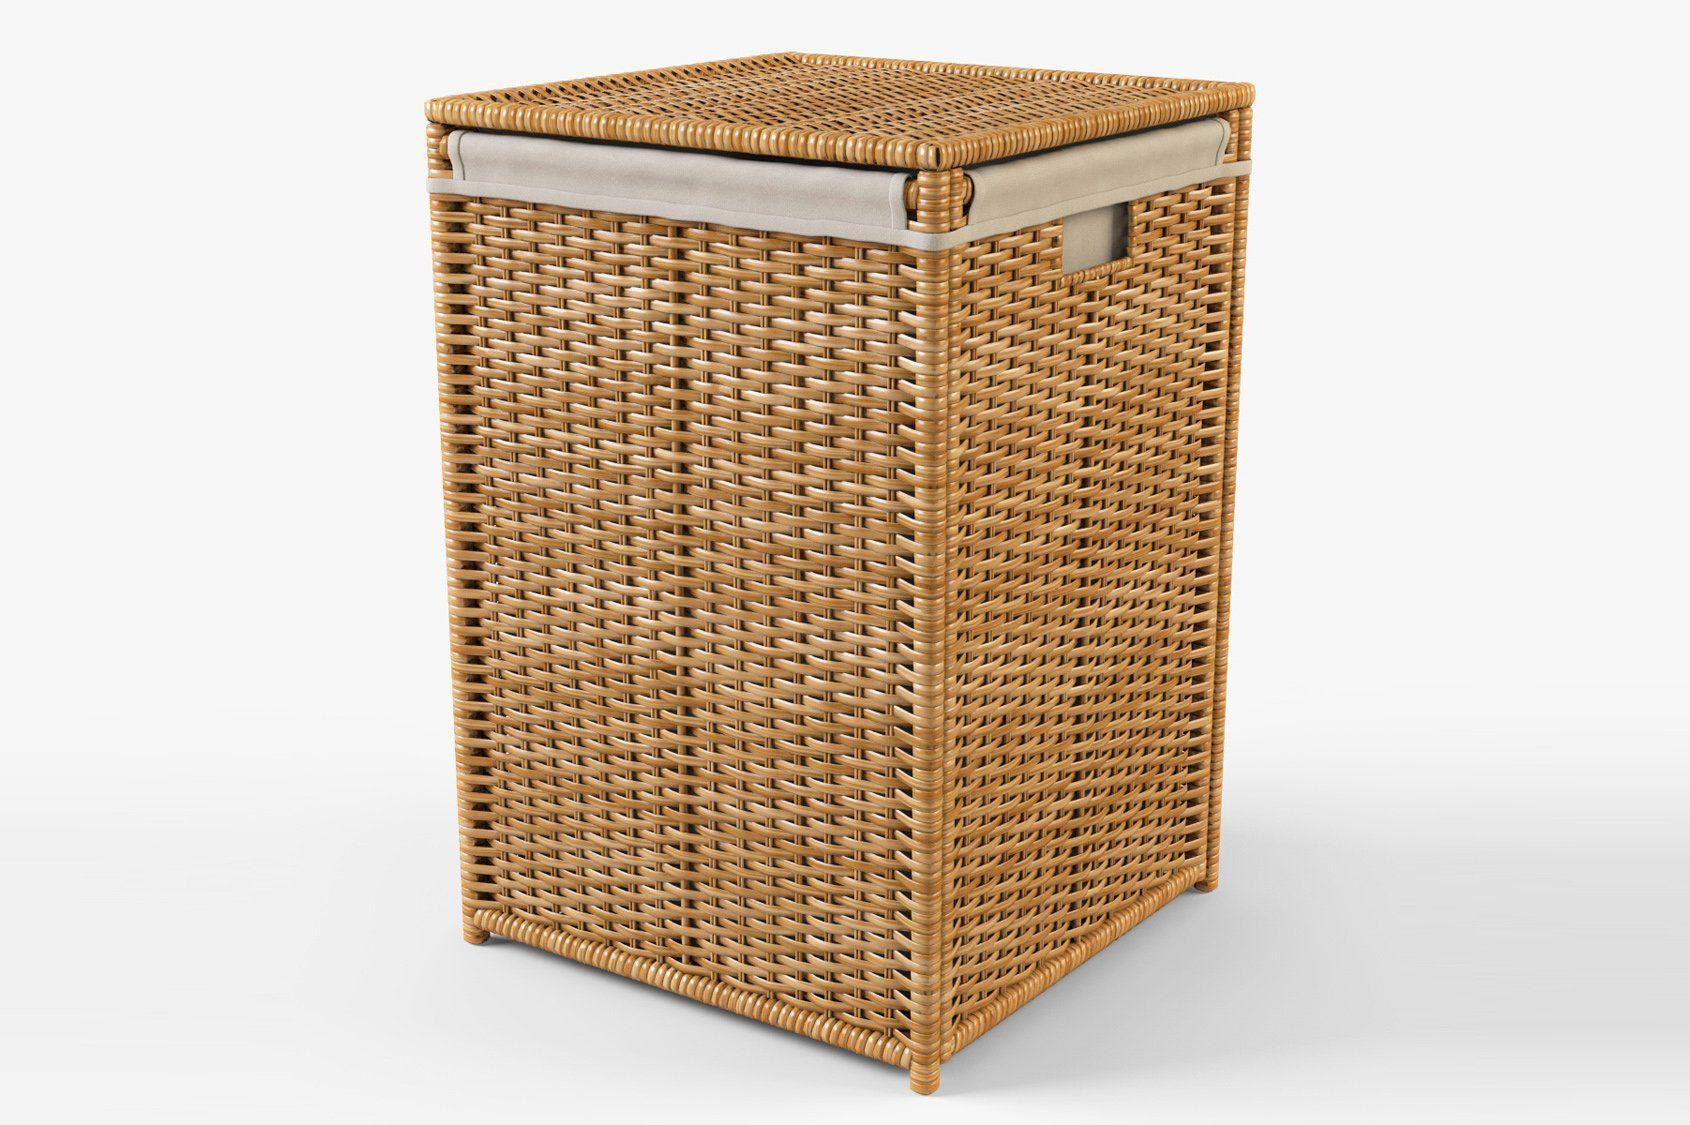 Laundry Basket Ikea Branas Ikea Crate Furniture Ikea Interior